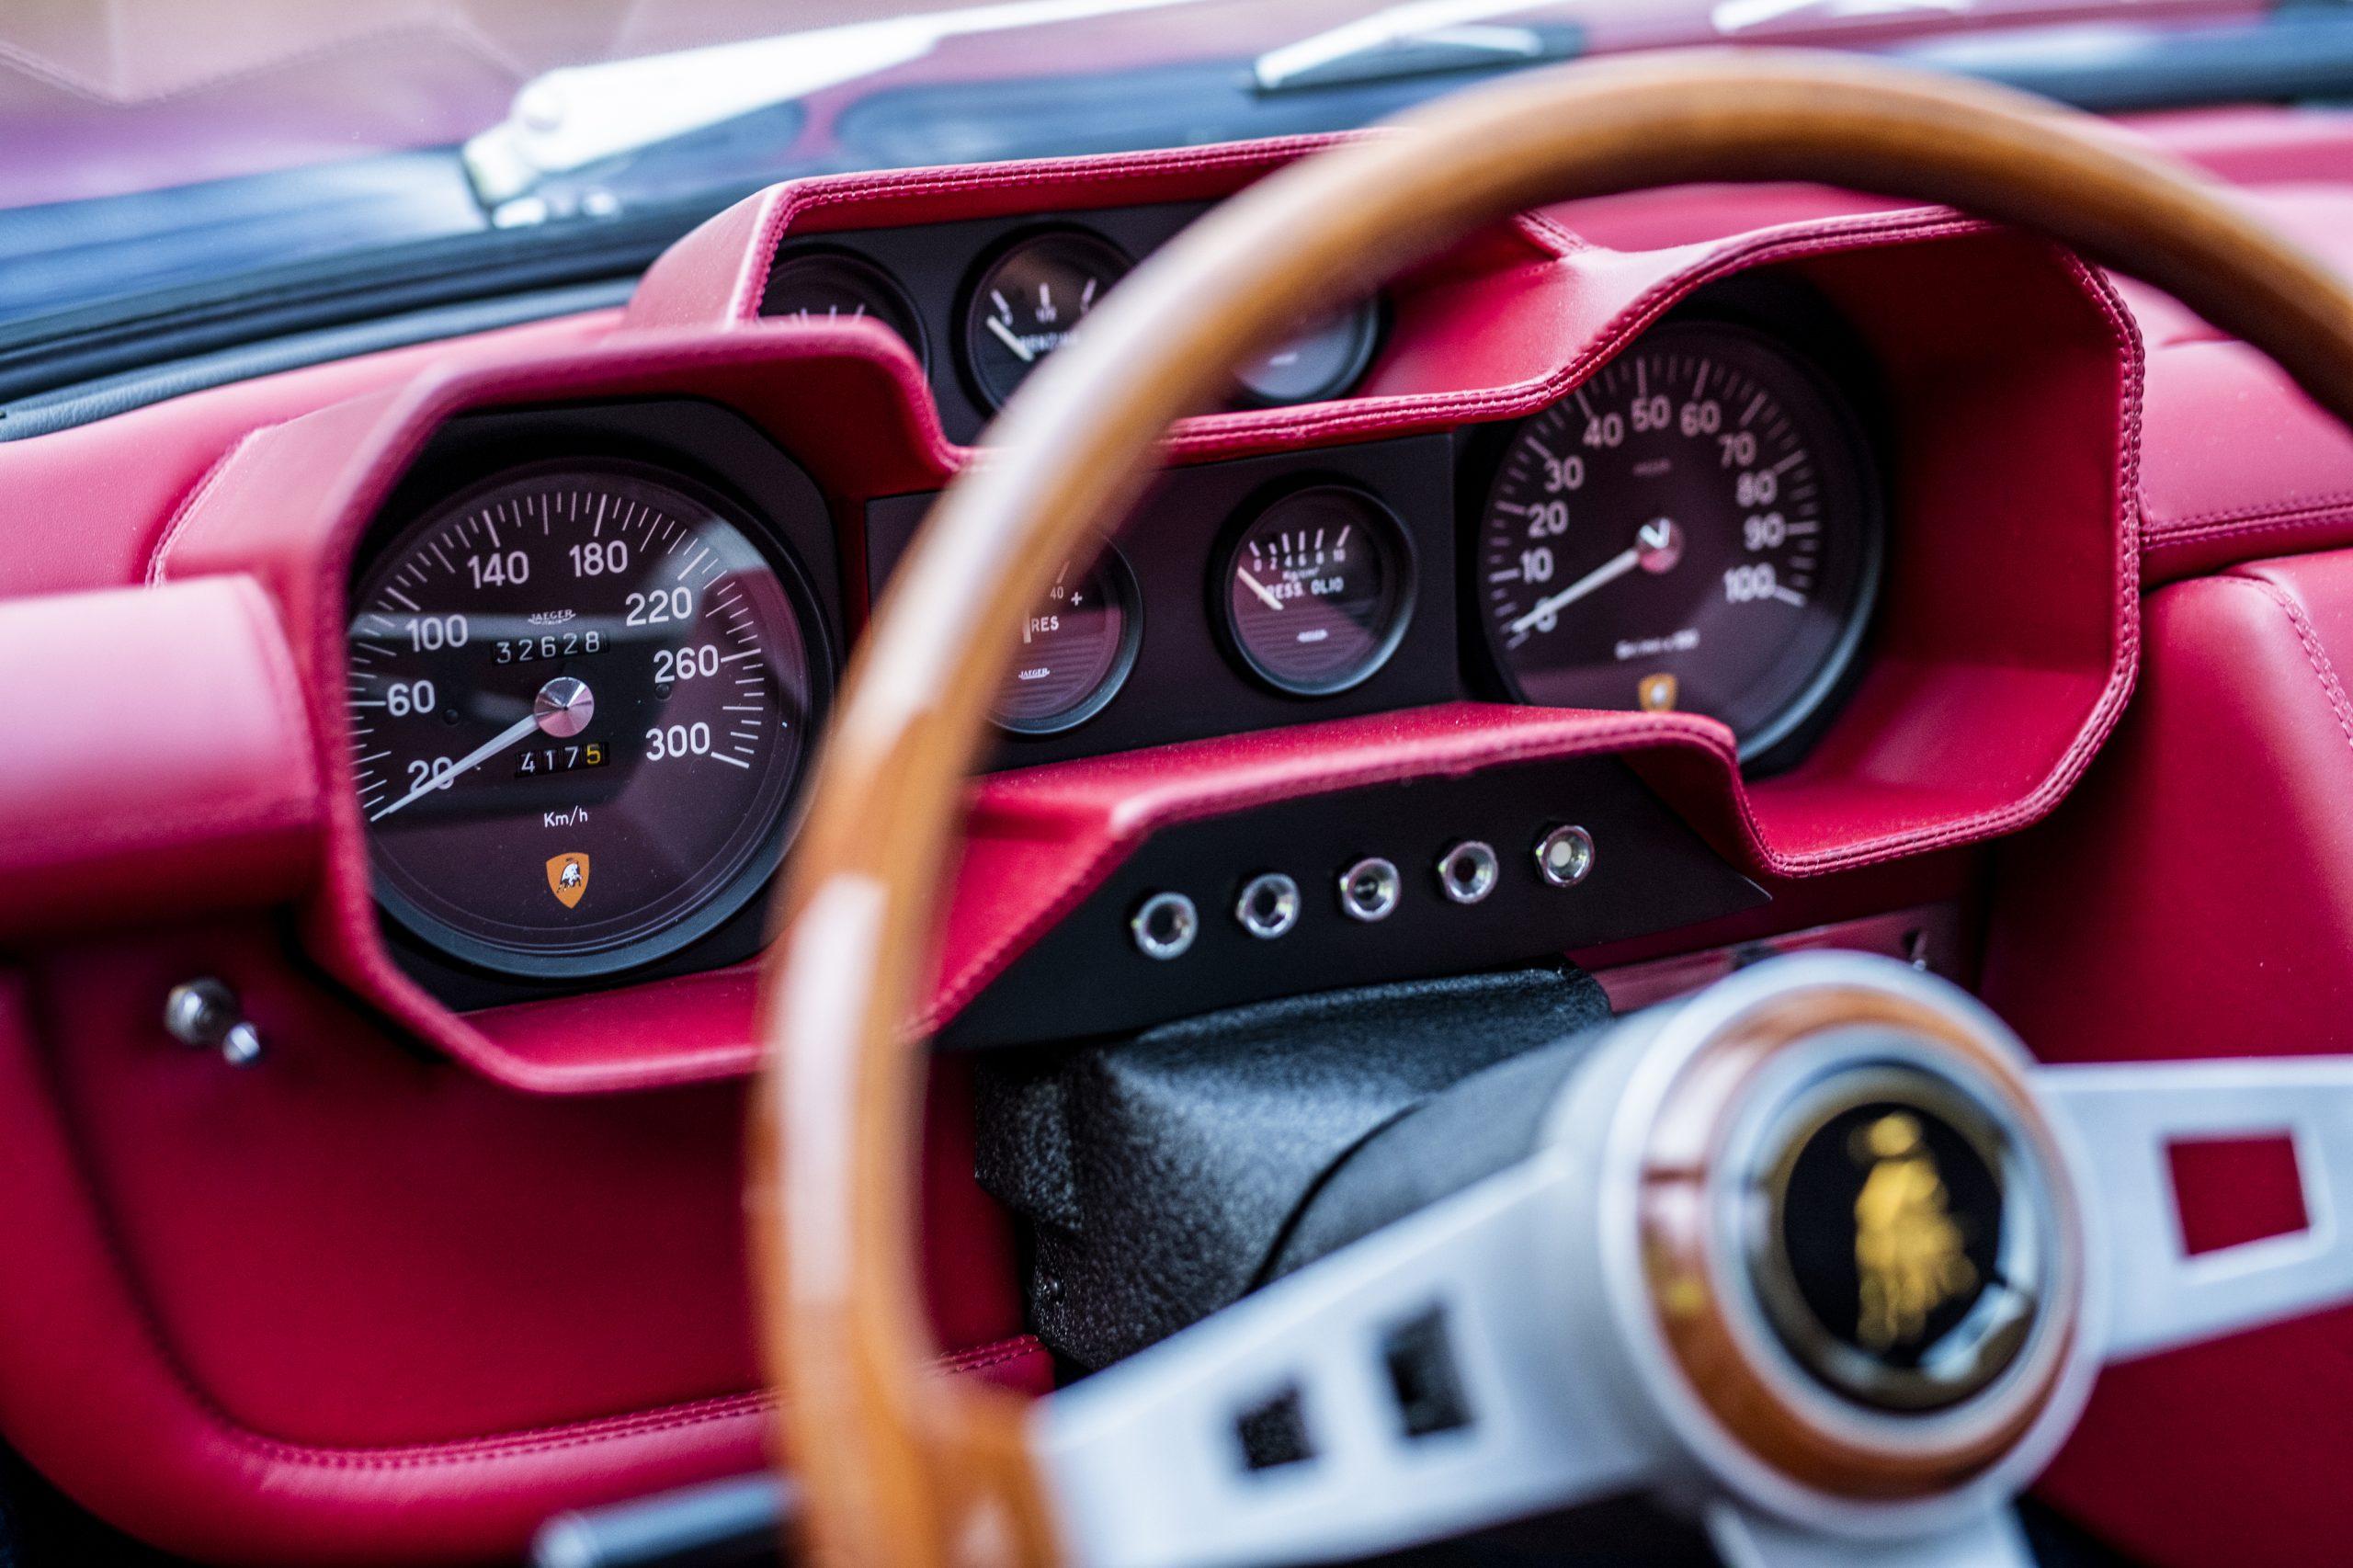 1968 Lamborghini Espada Series I by Bertone interior gauges